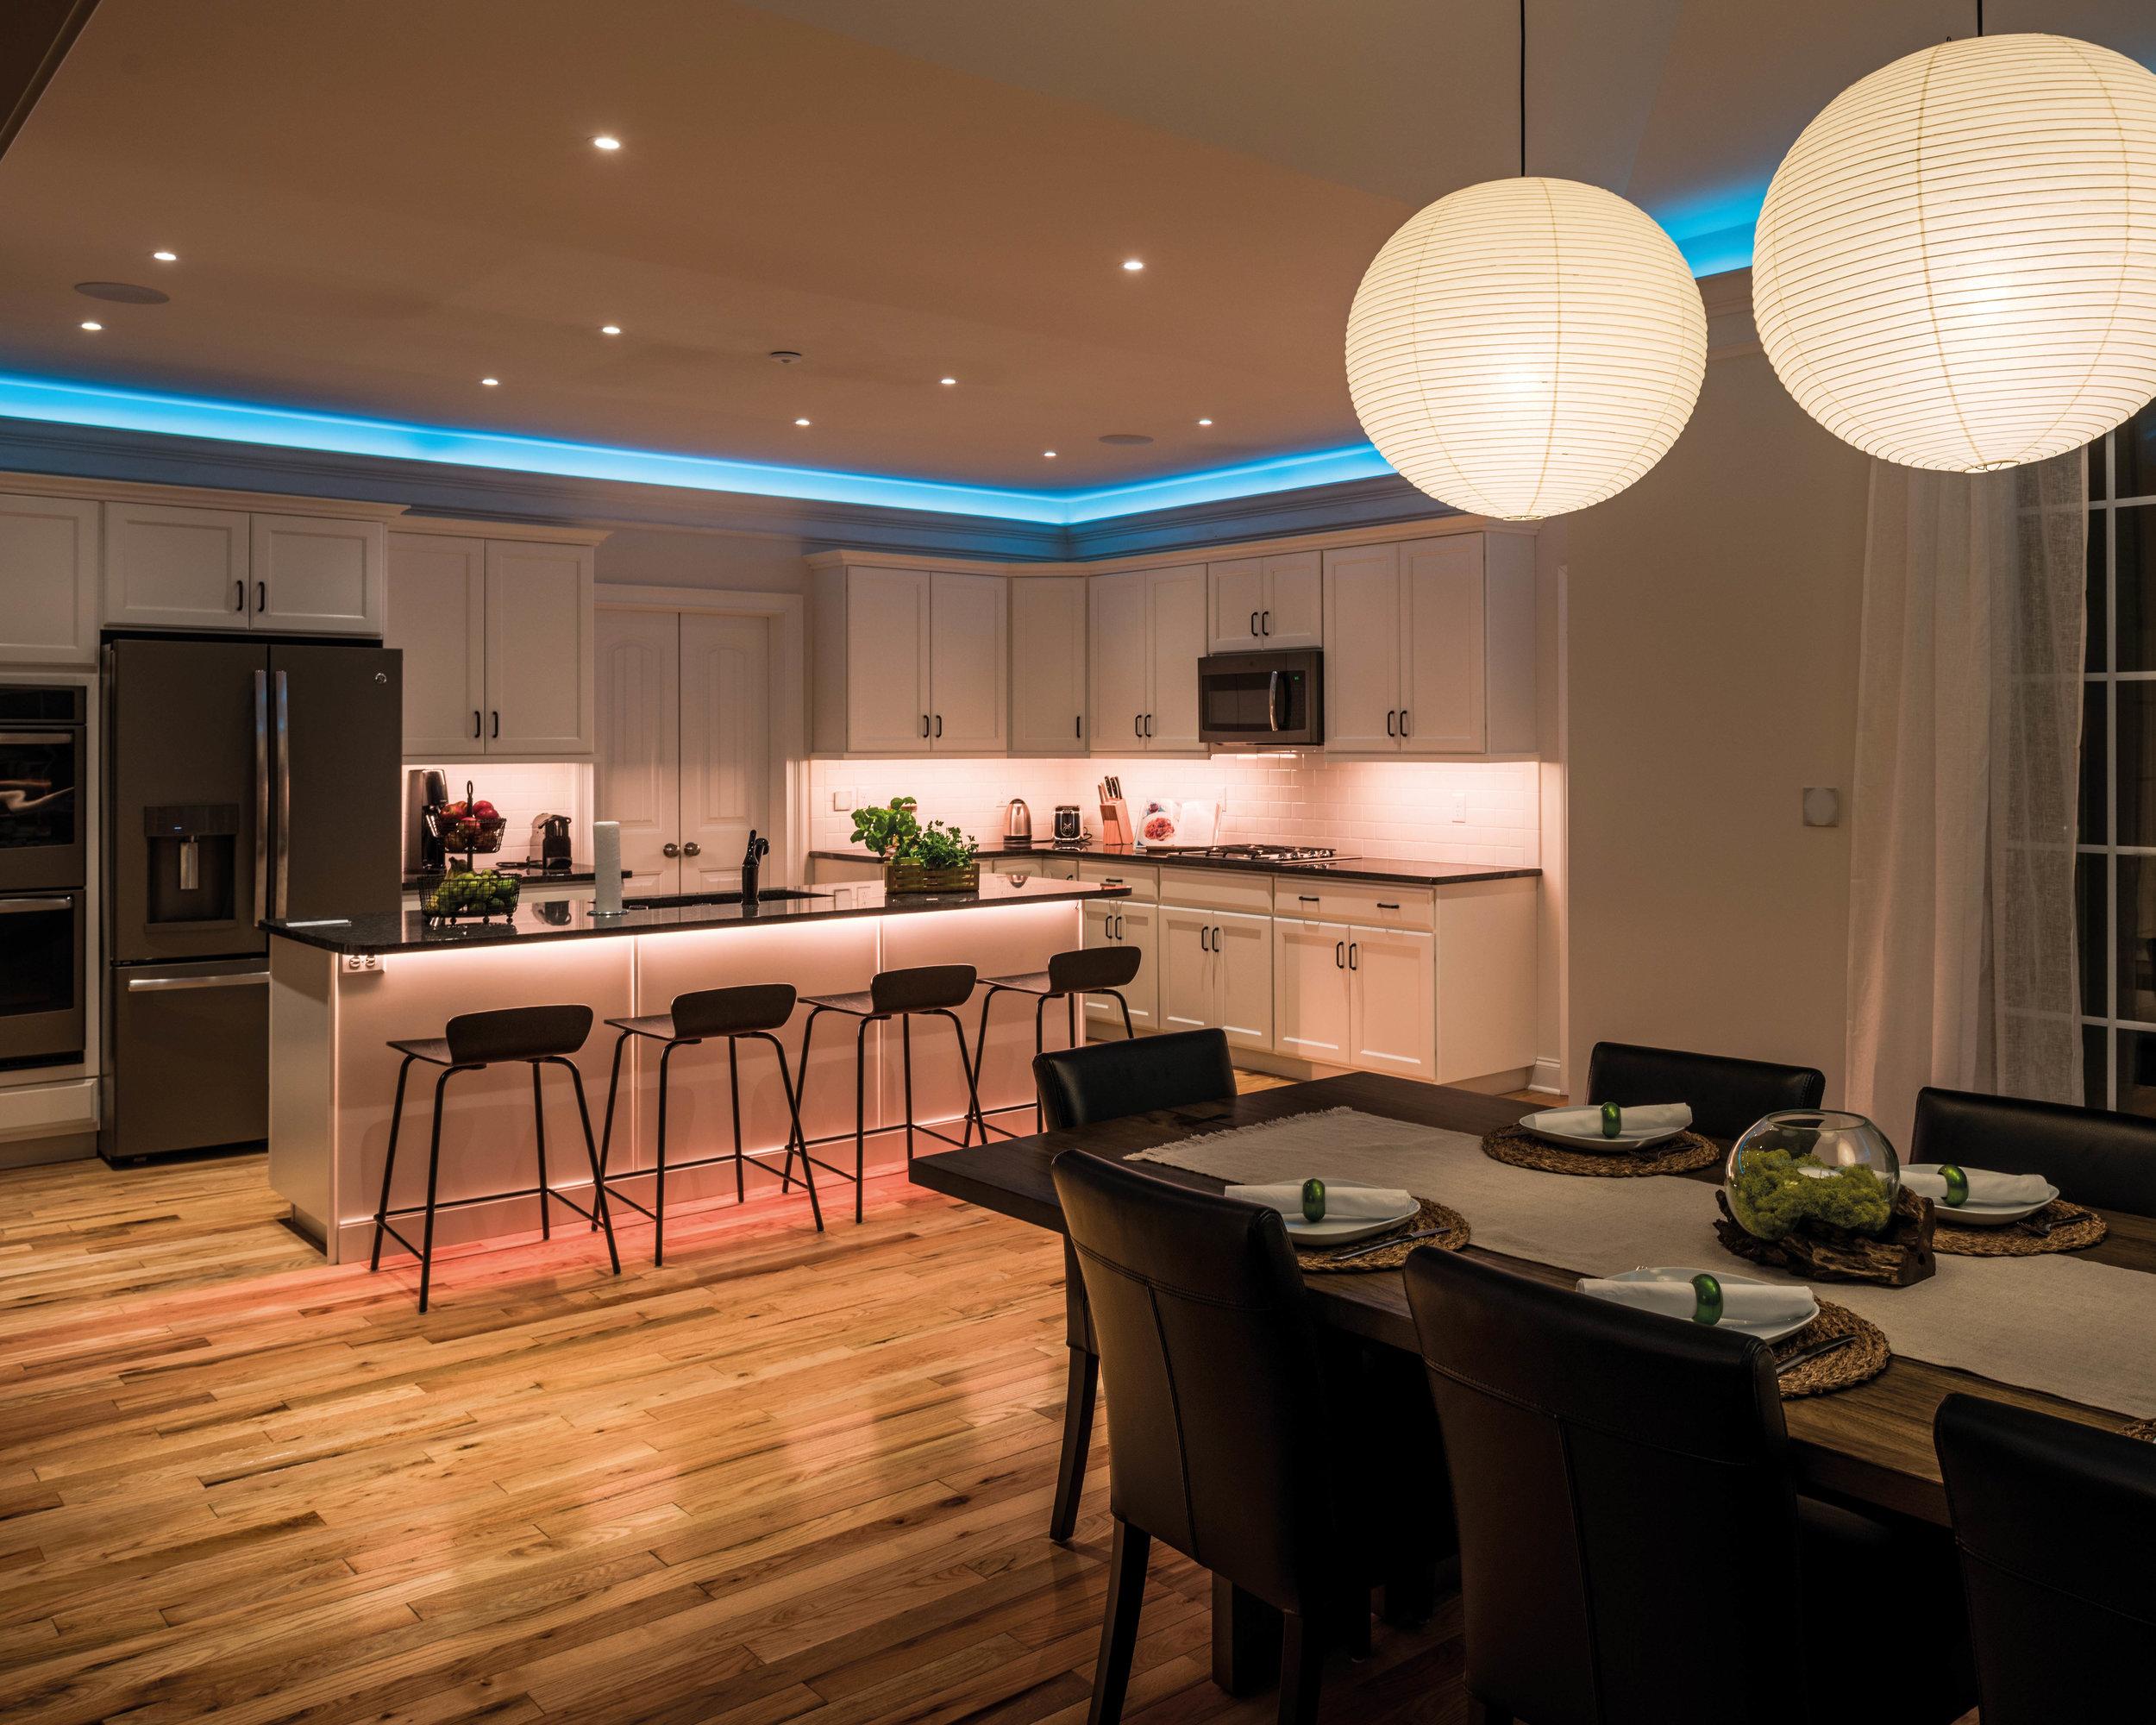 A Loxone smart model home. Photo credit: Loxone